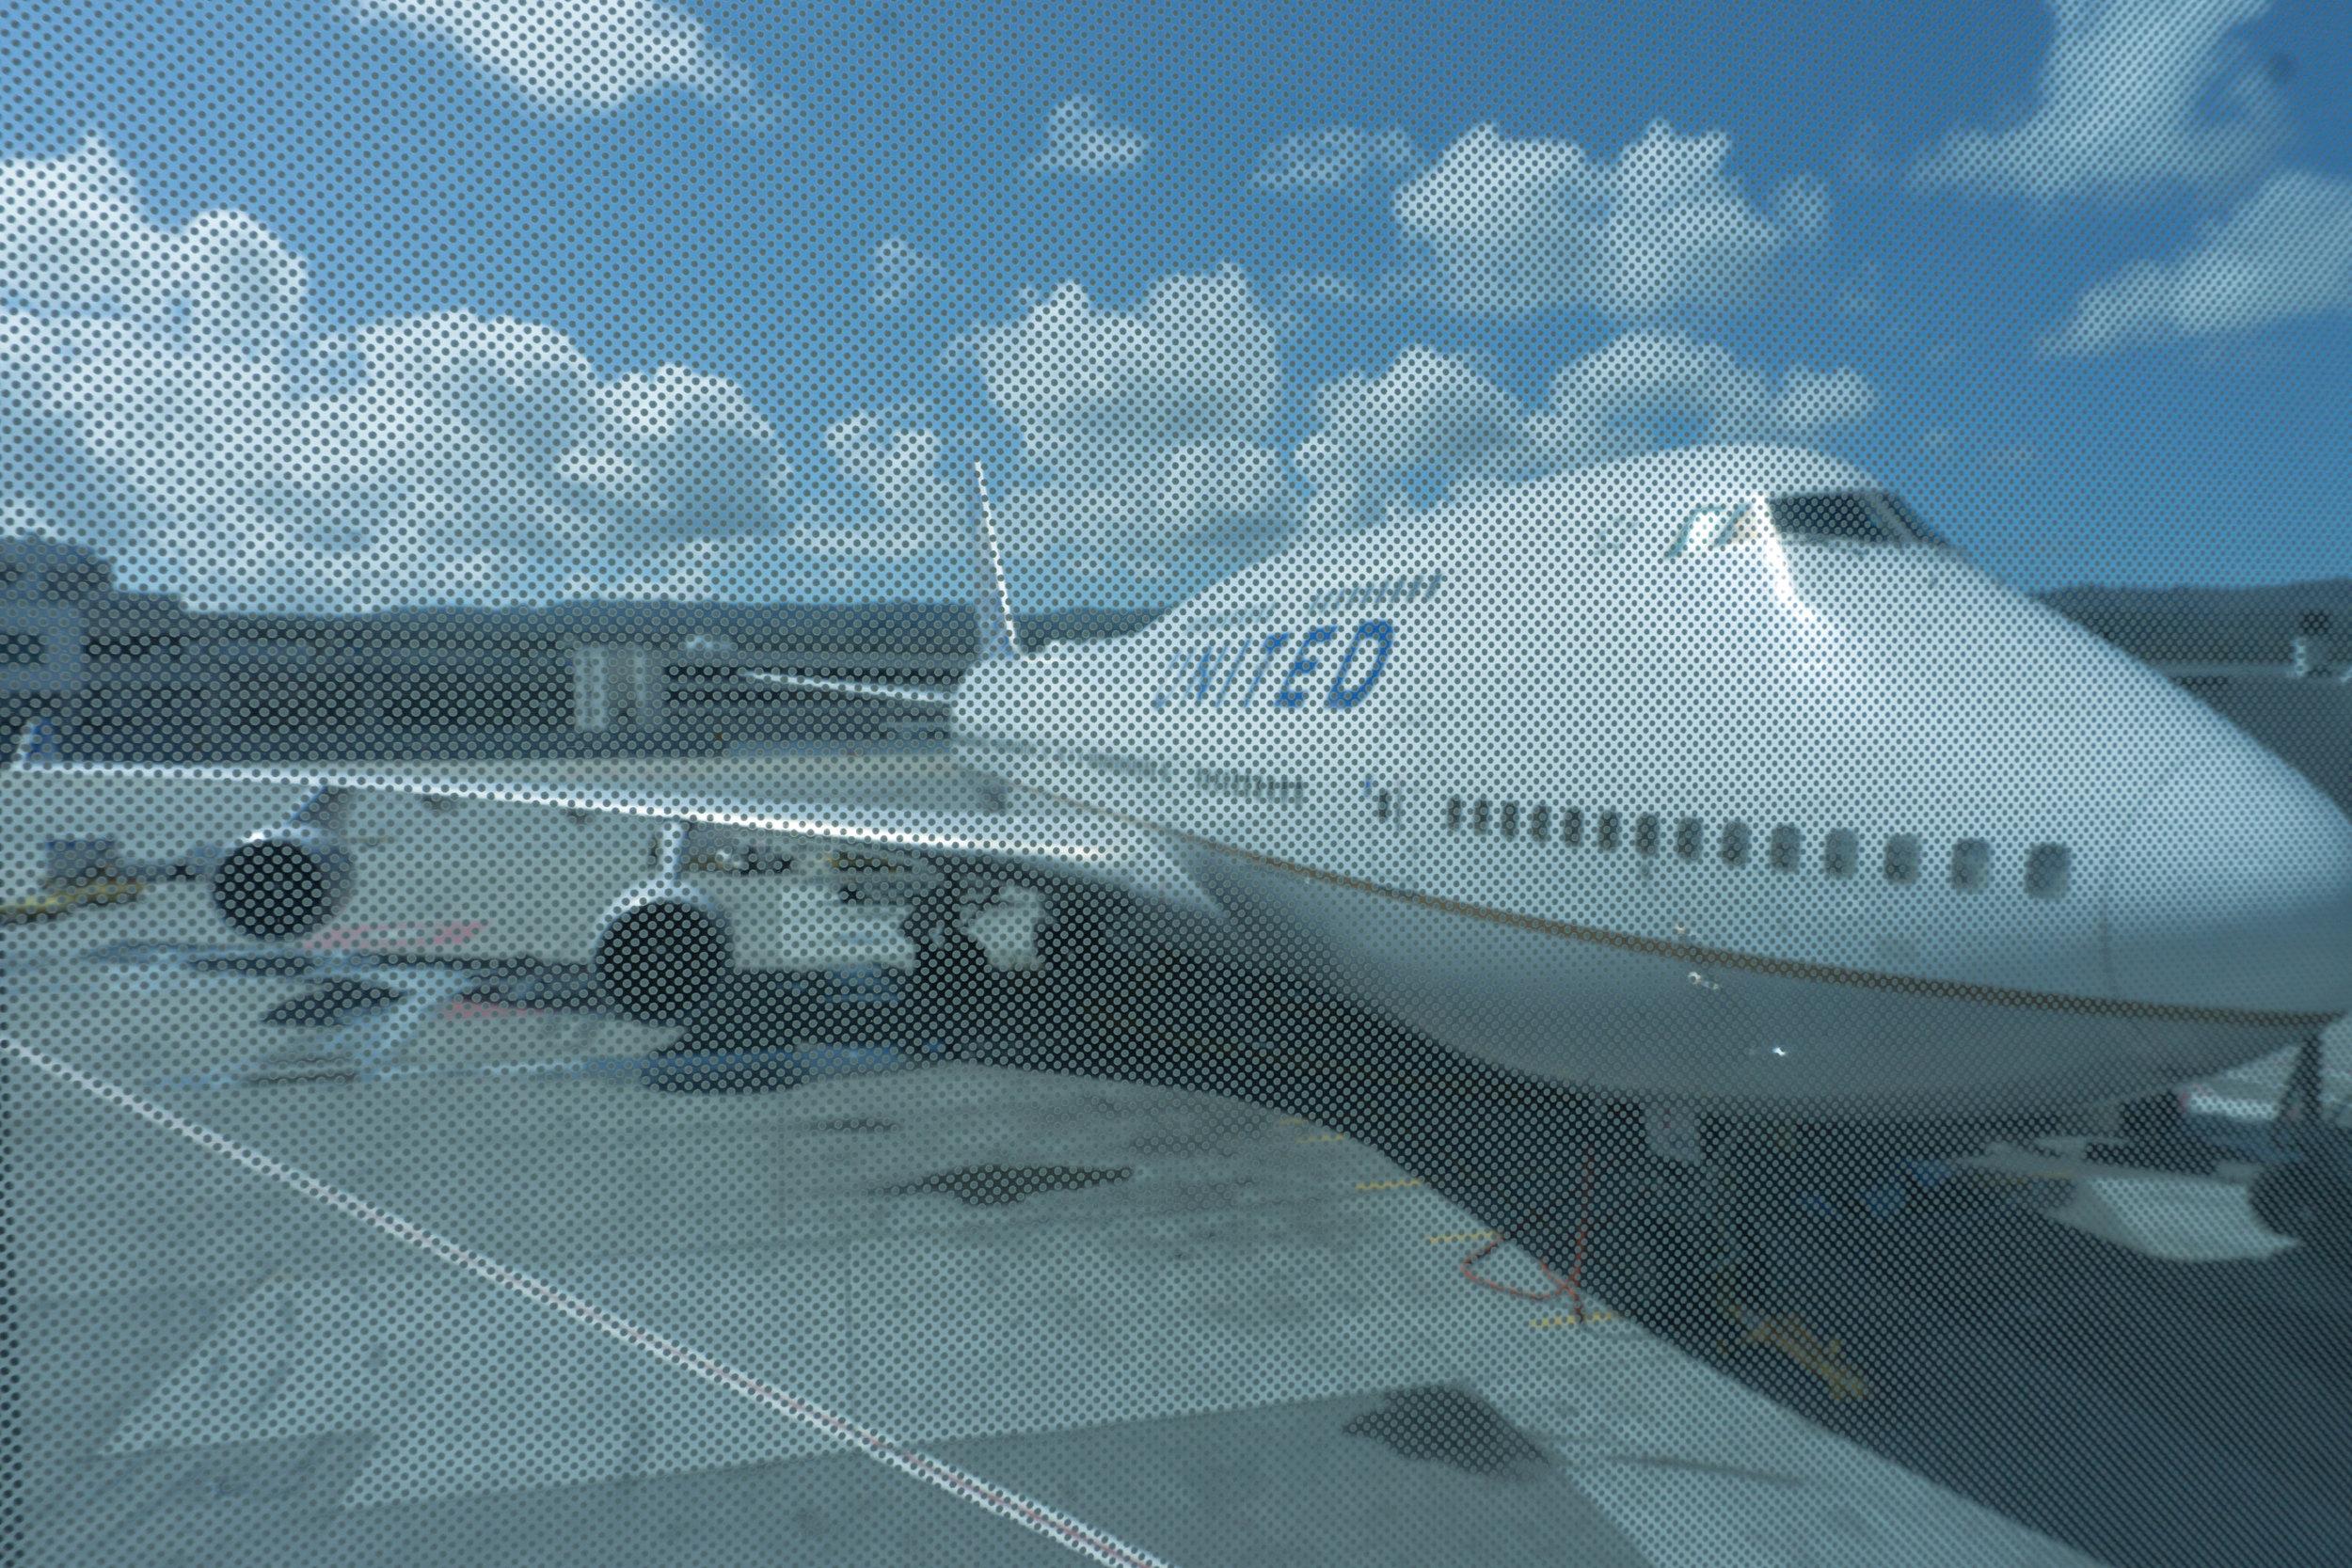 DSC00900.jpg